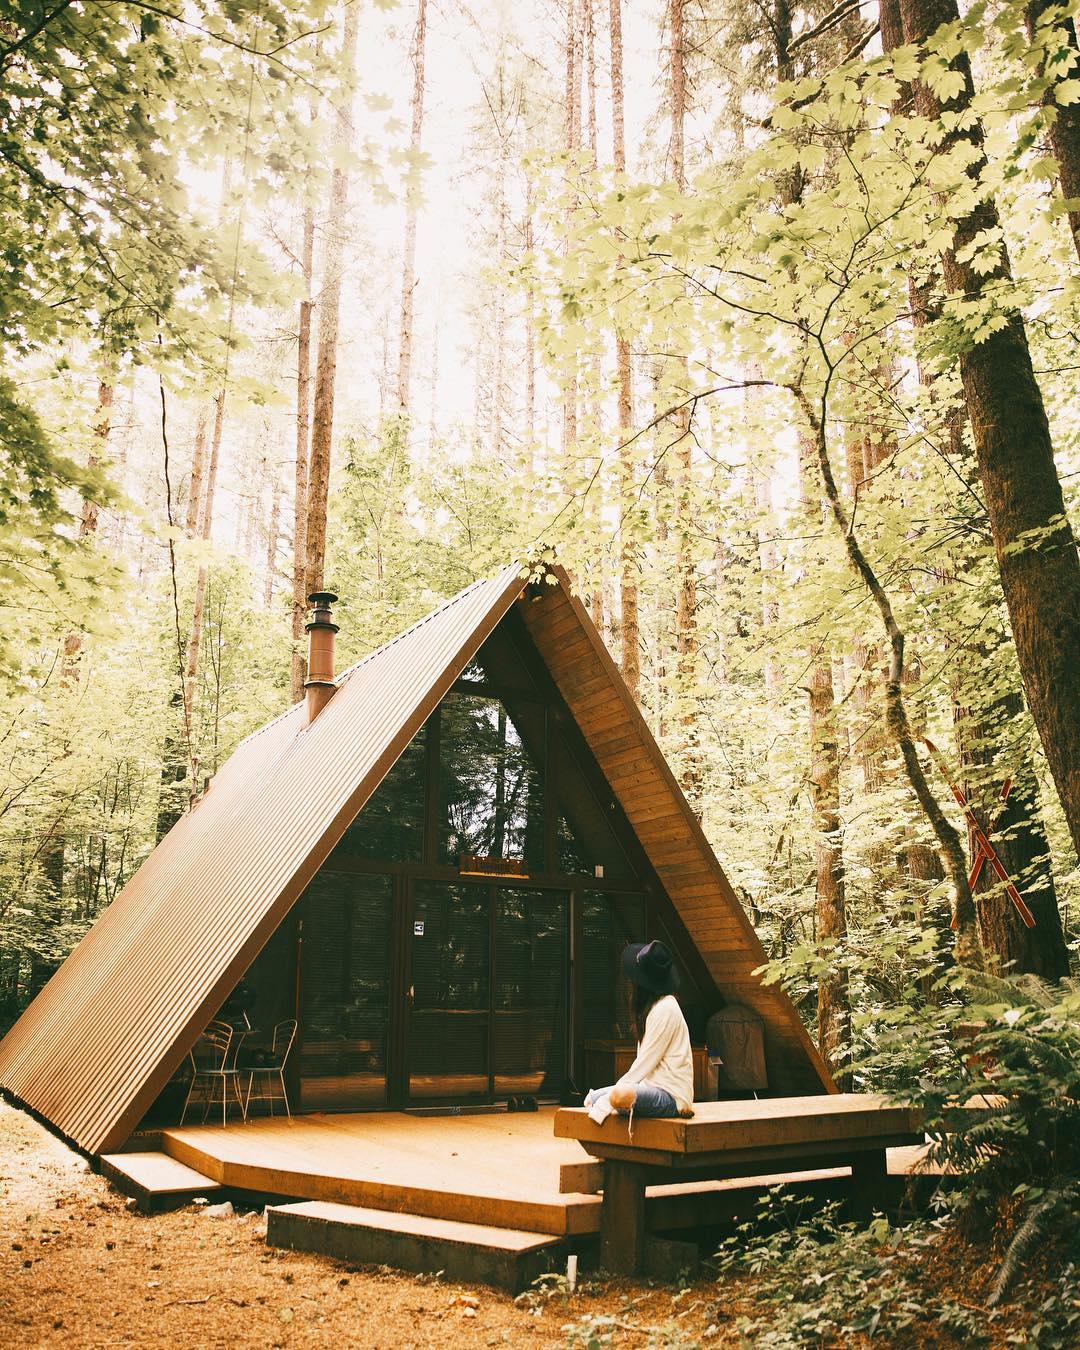 40 Of The World S Top Cabin Getaways